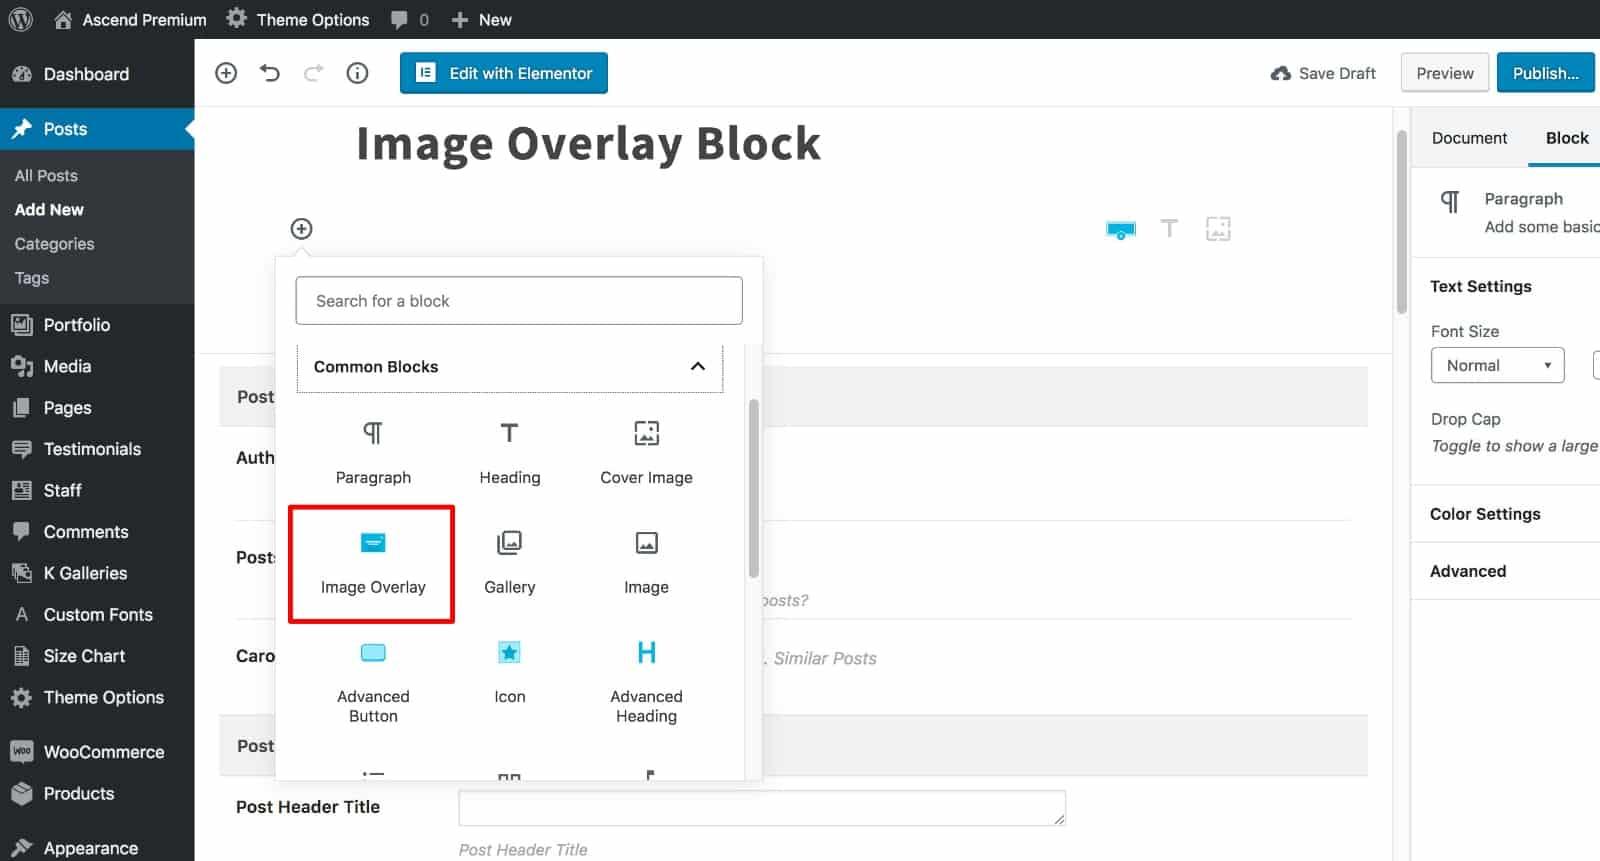 Image Overlay Block